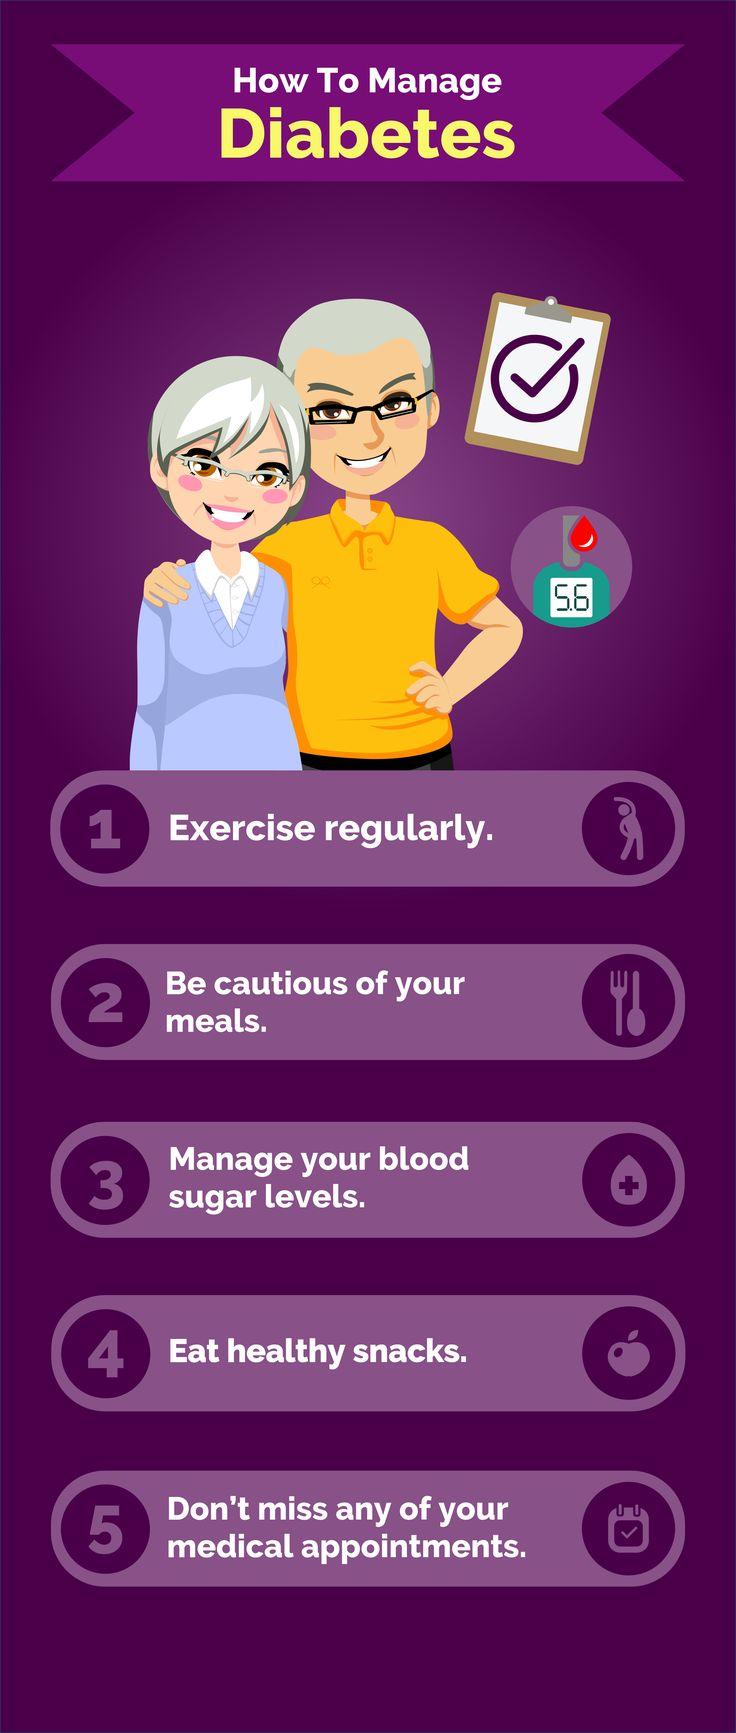 How To Manage Diabetes #diabetes #management